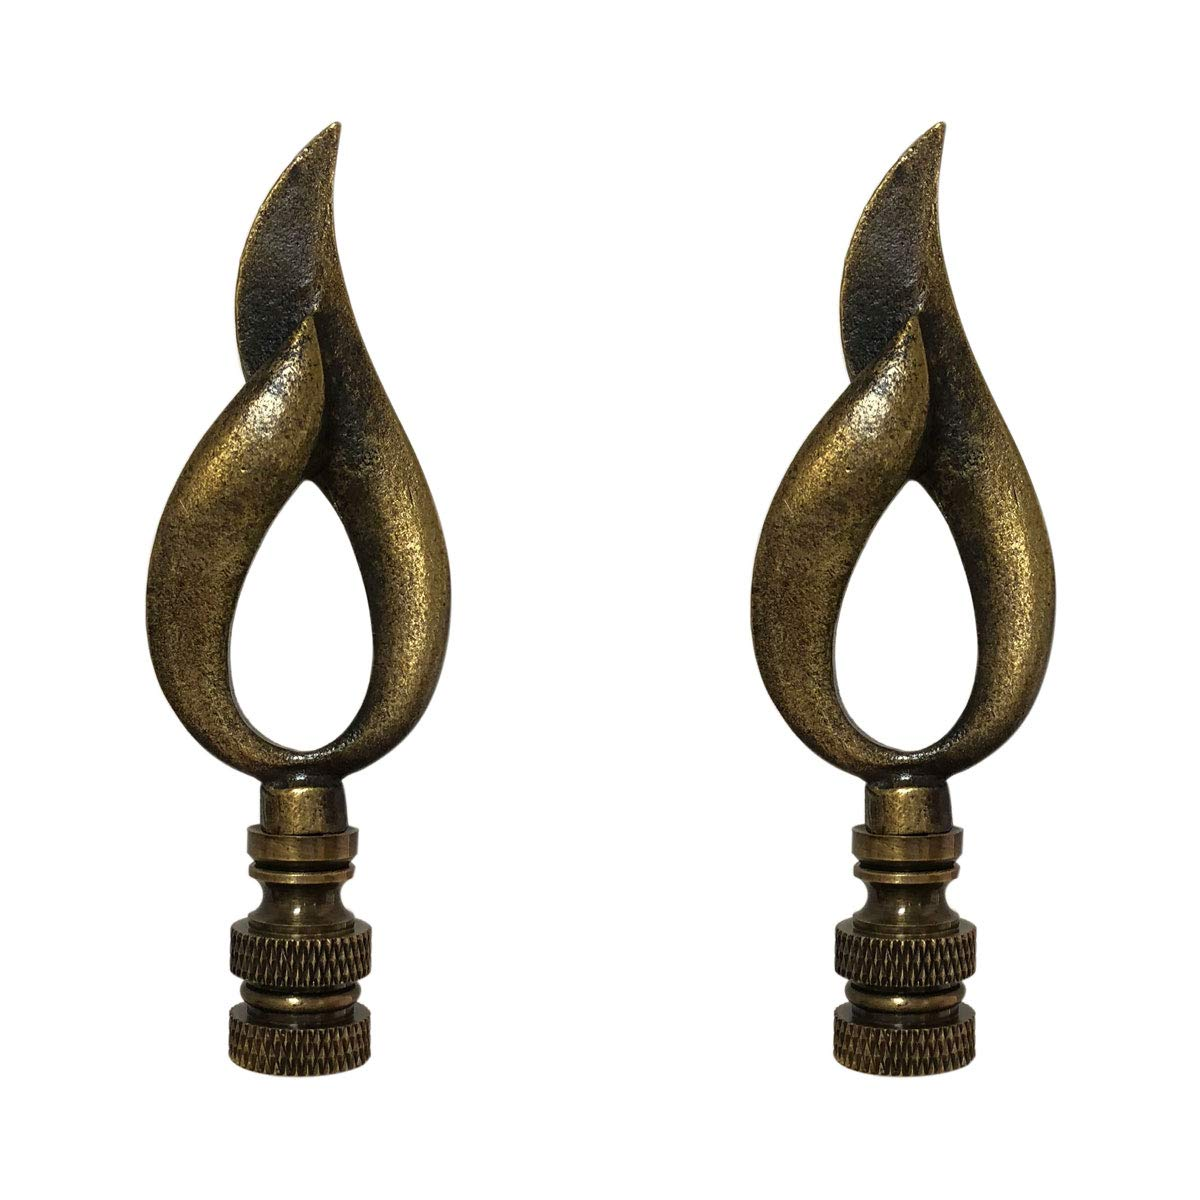 Royal Designs F-5073AB-2 Single Flame Design Lamp Finial, Antique Brass, Set of 2